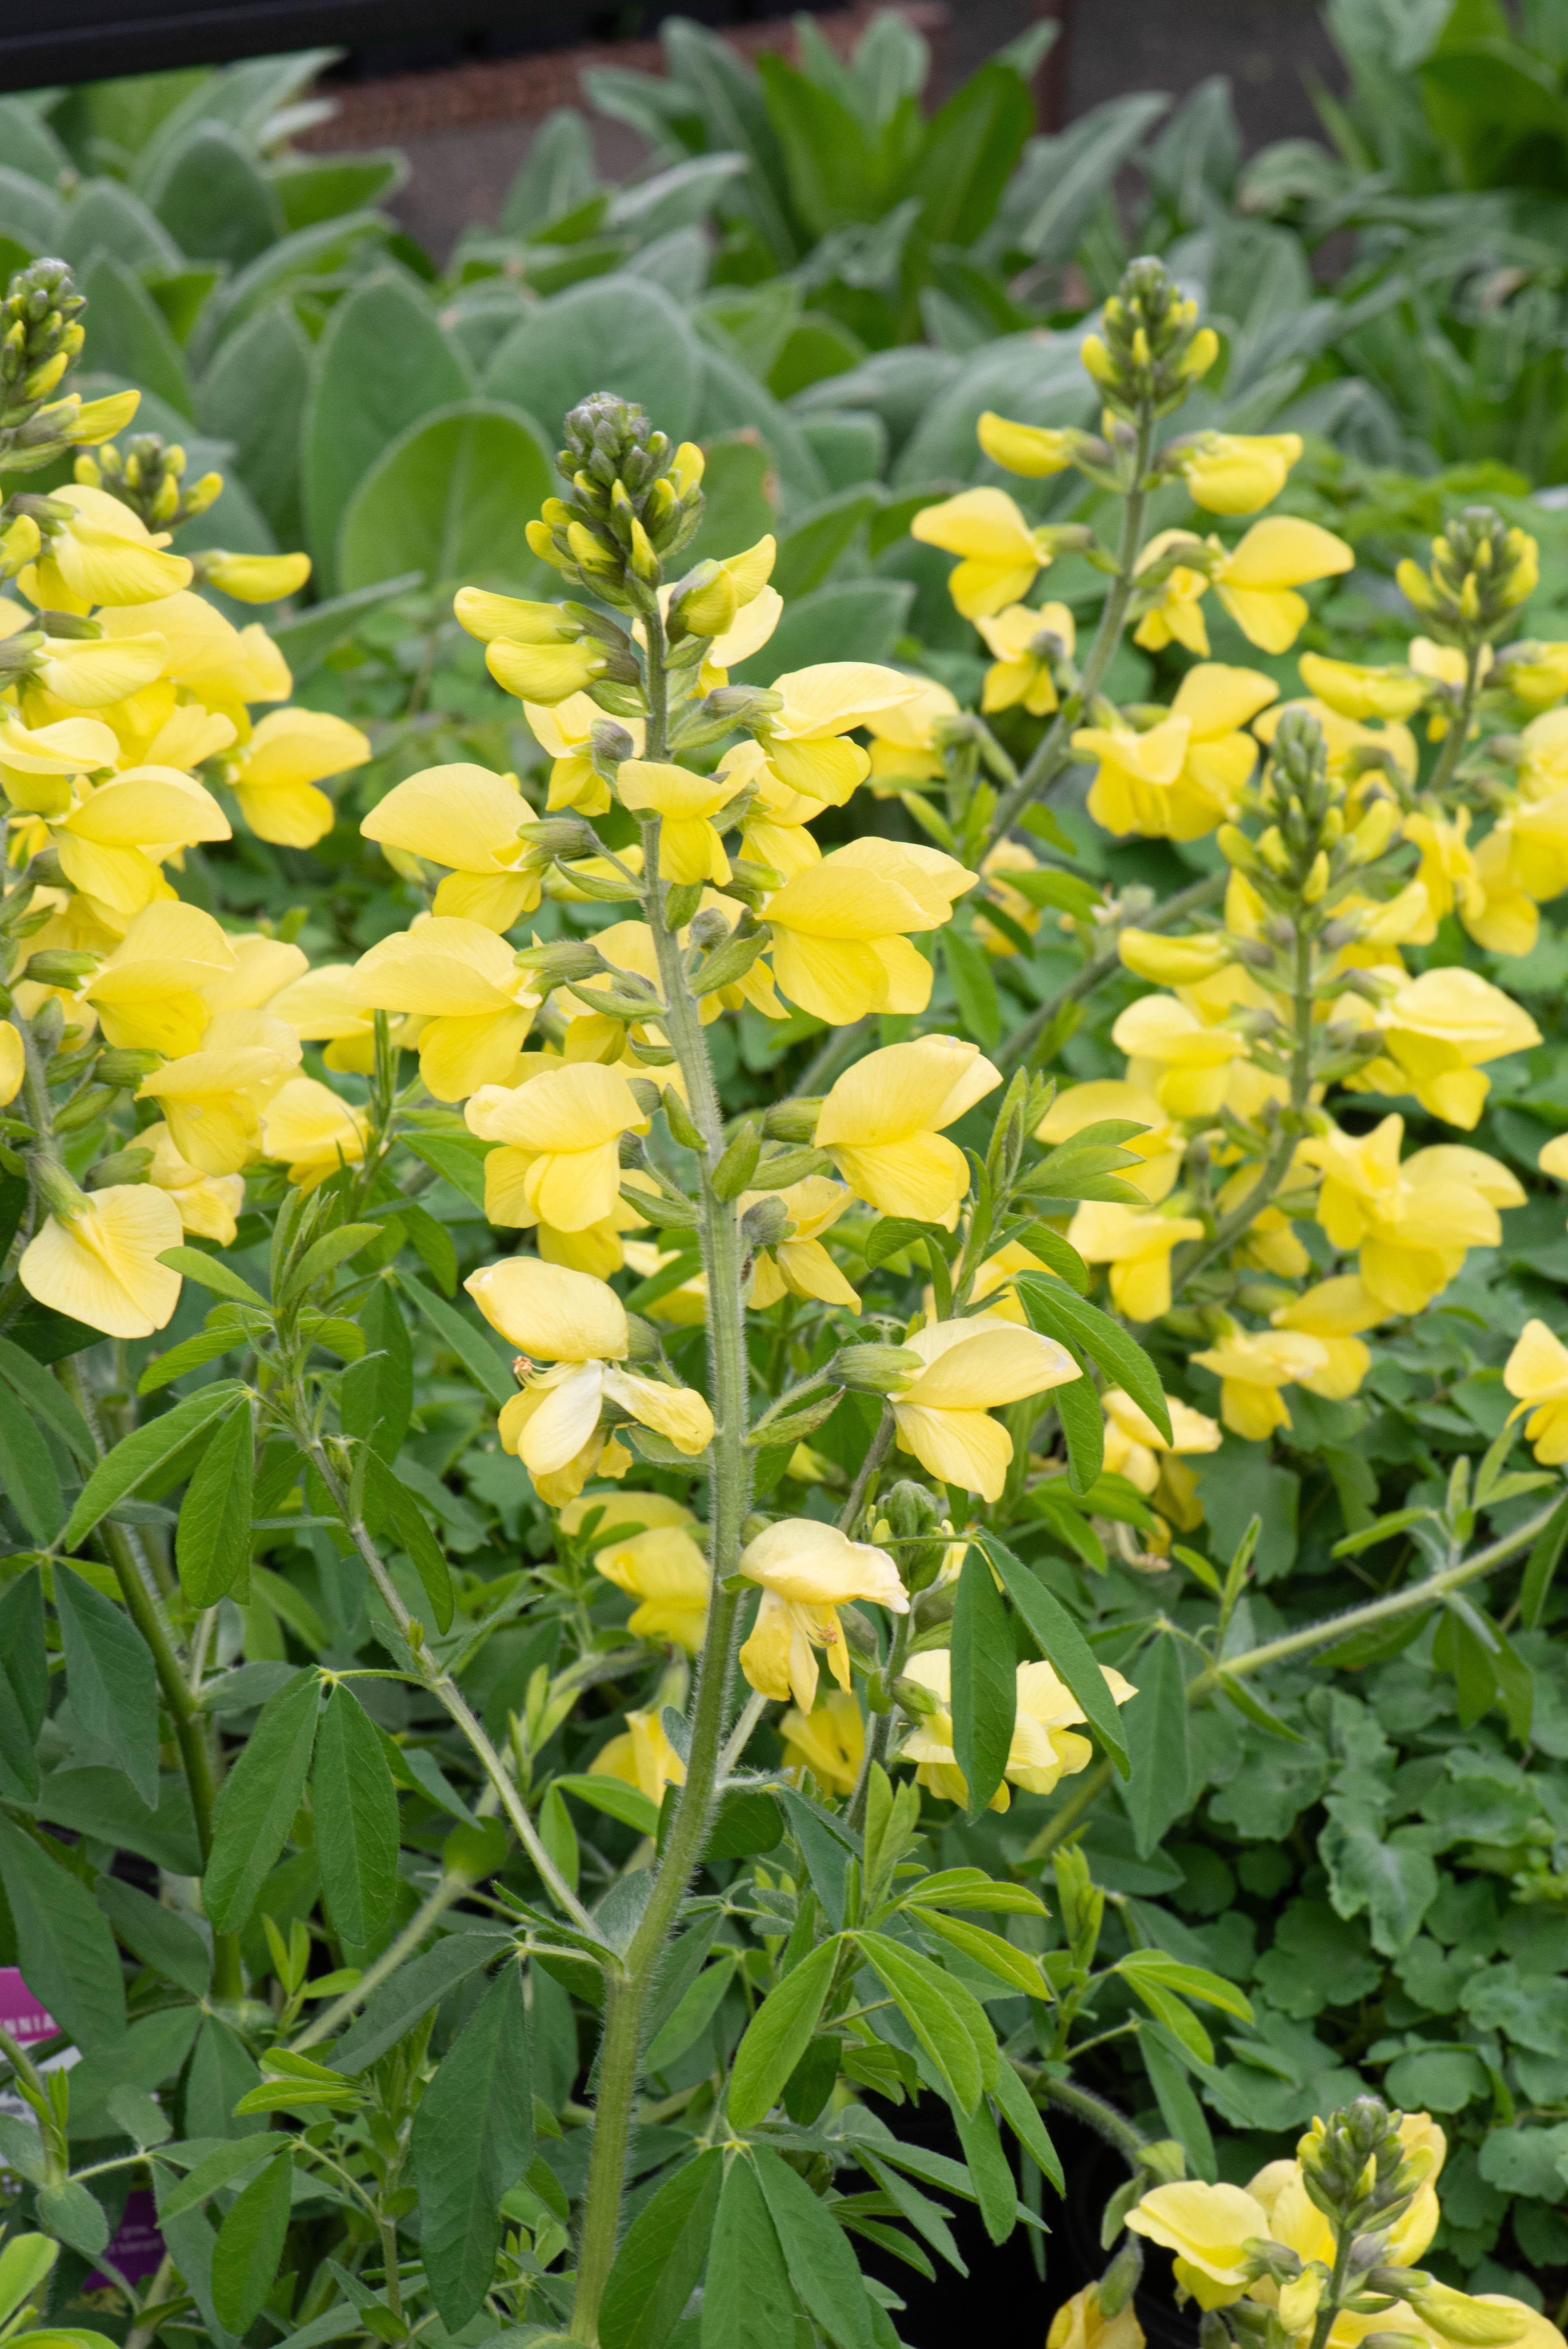 Thermopsis chinensis 'Sophia', Pea Bush, perennial, sun, drought tolerant, Merrifield Garden Center